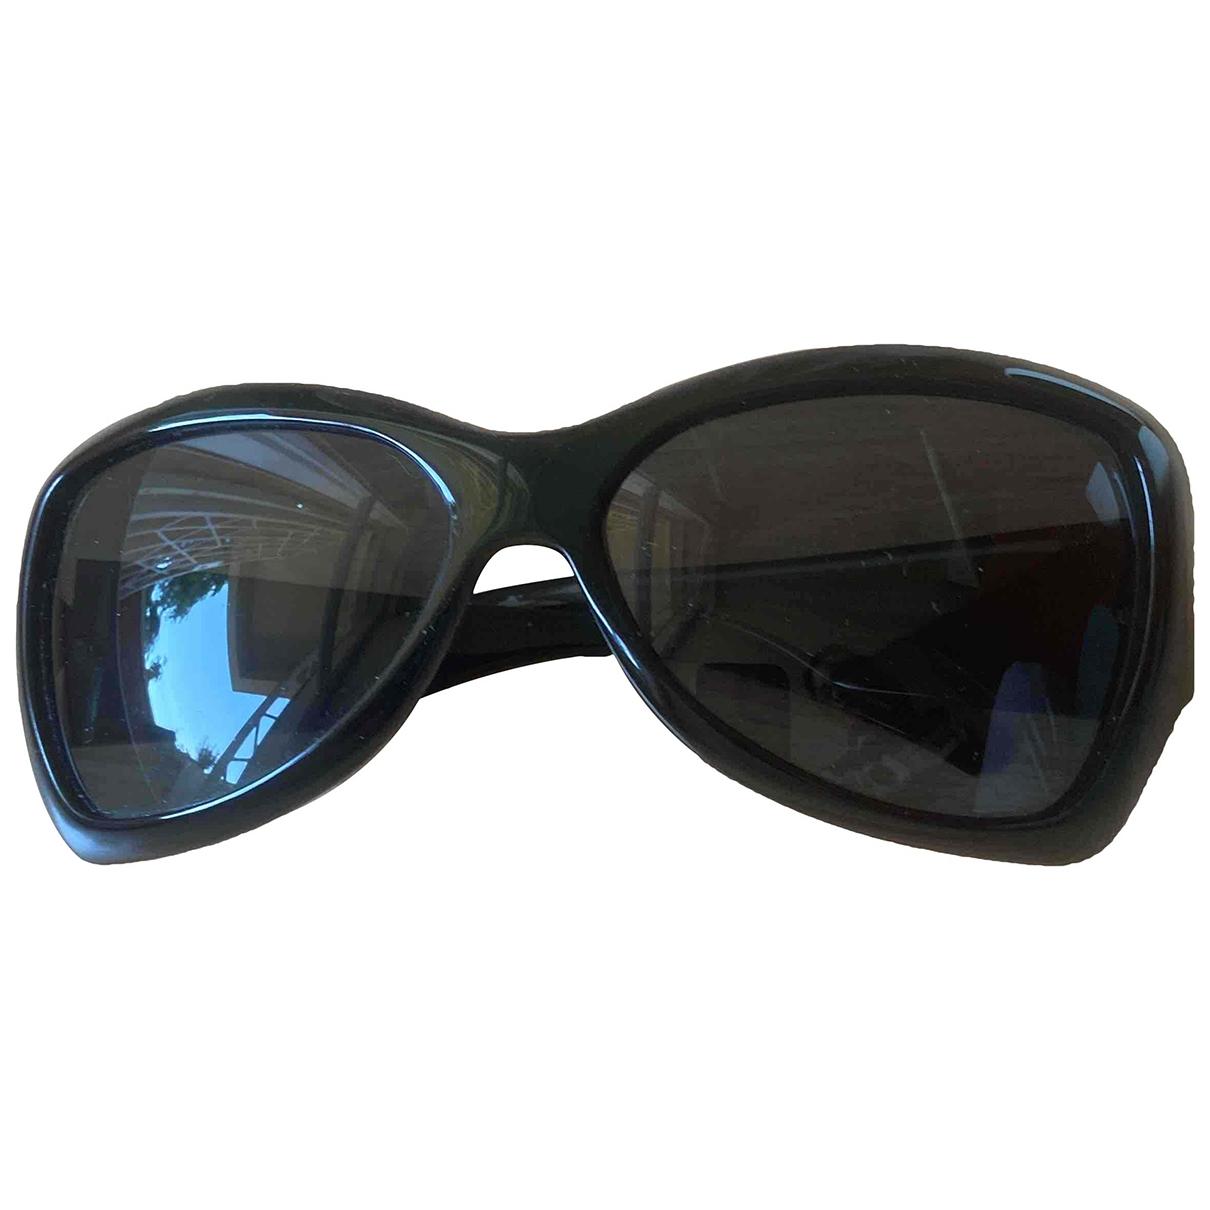 Yves Saint Laurent \N Sonnenbrillen in  Gruen Kunststoff